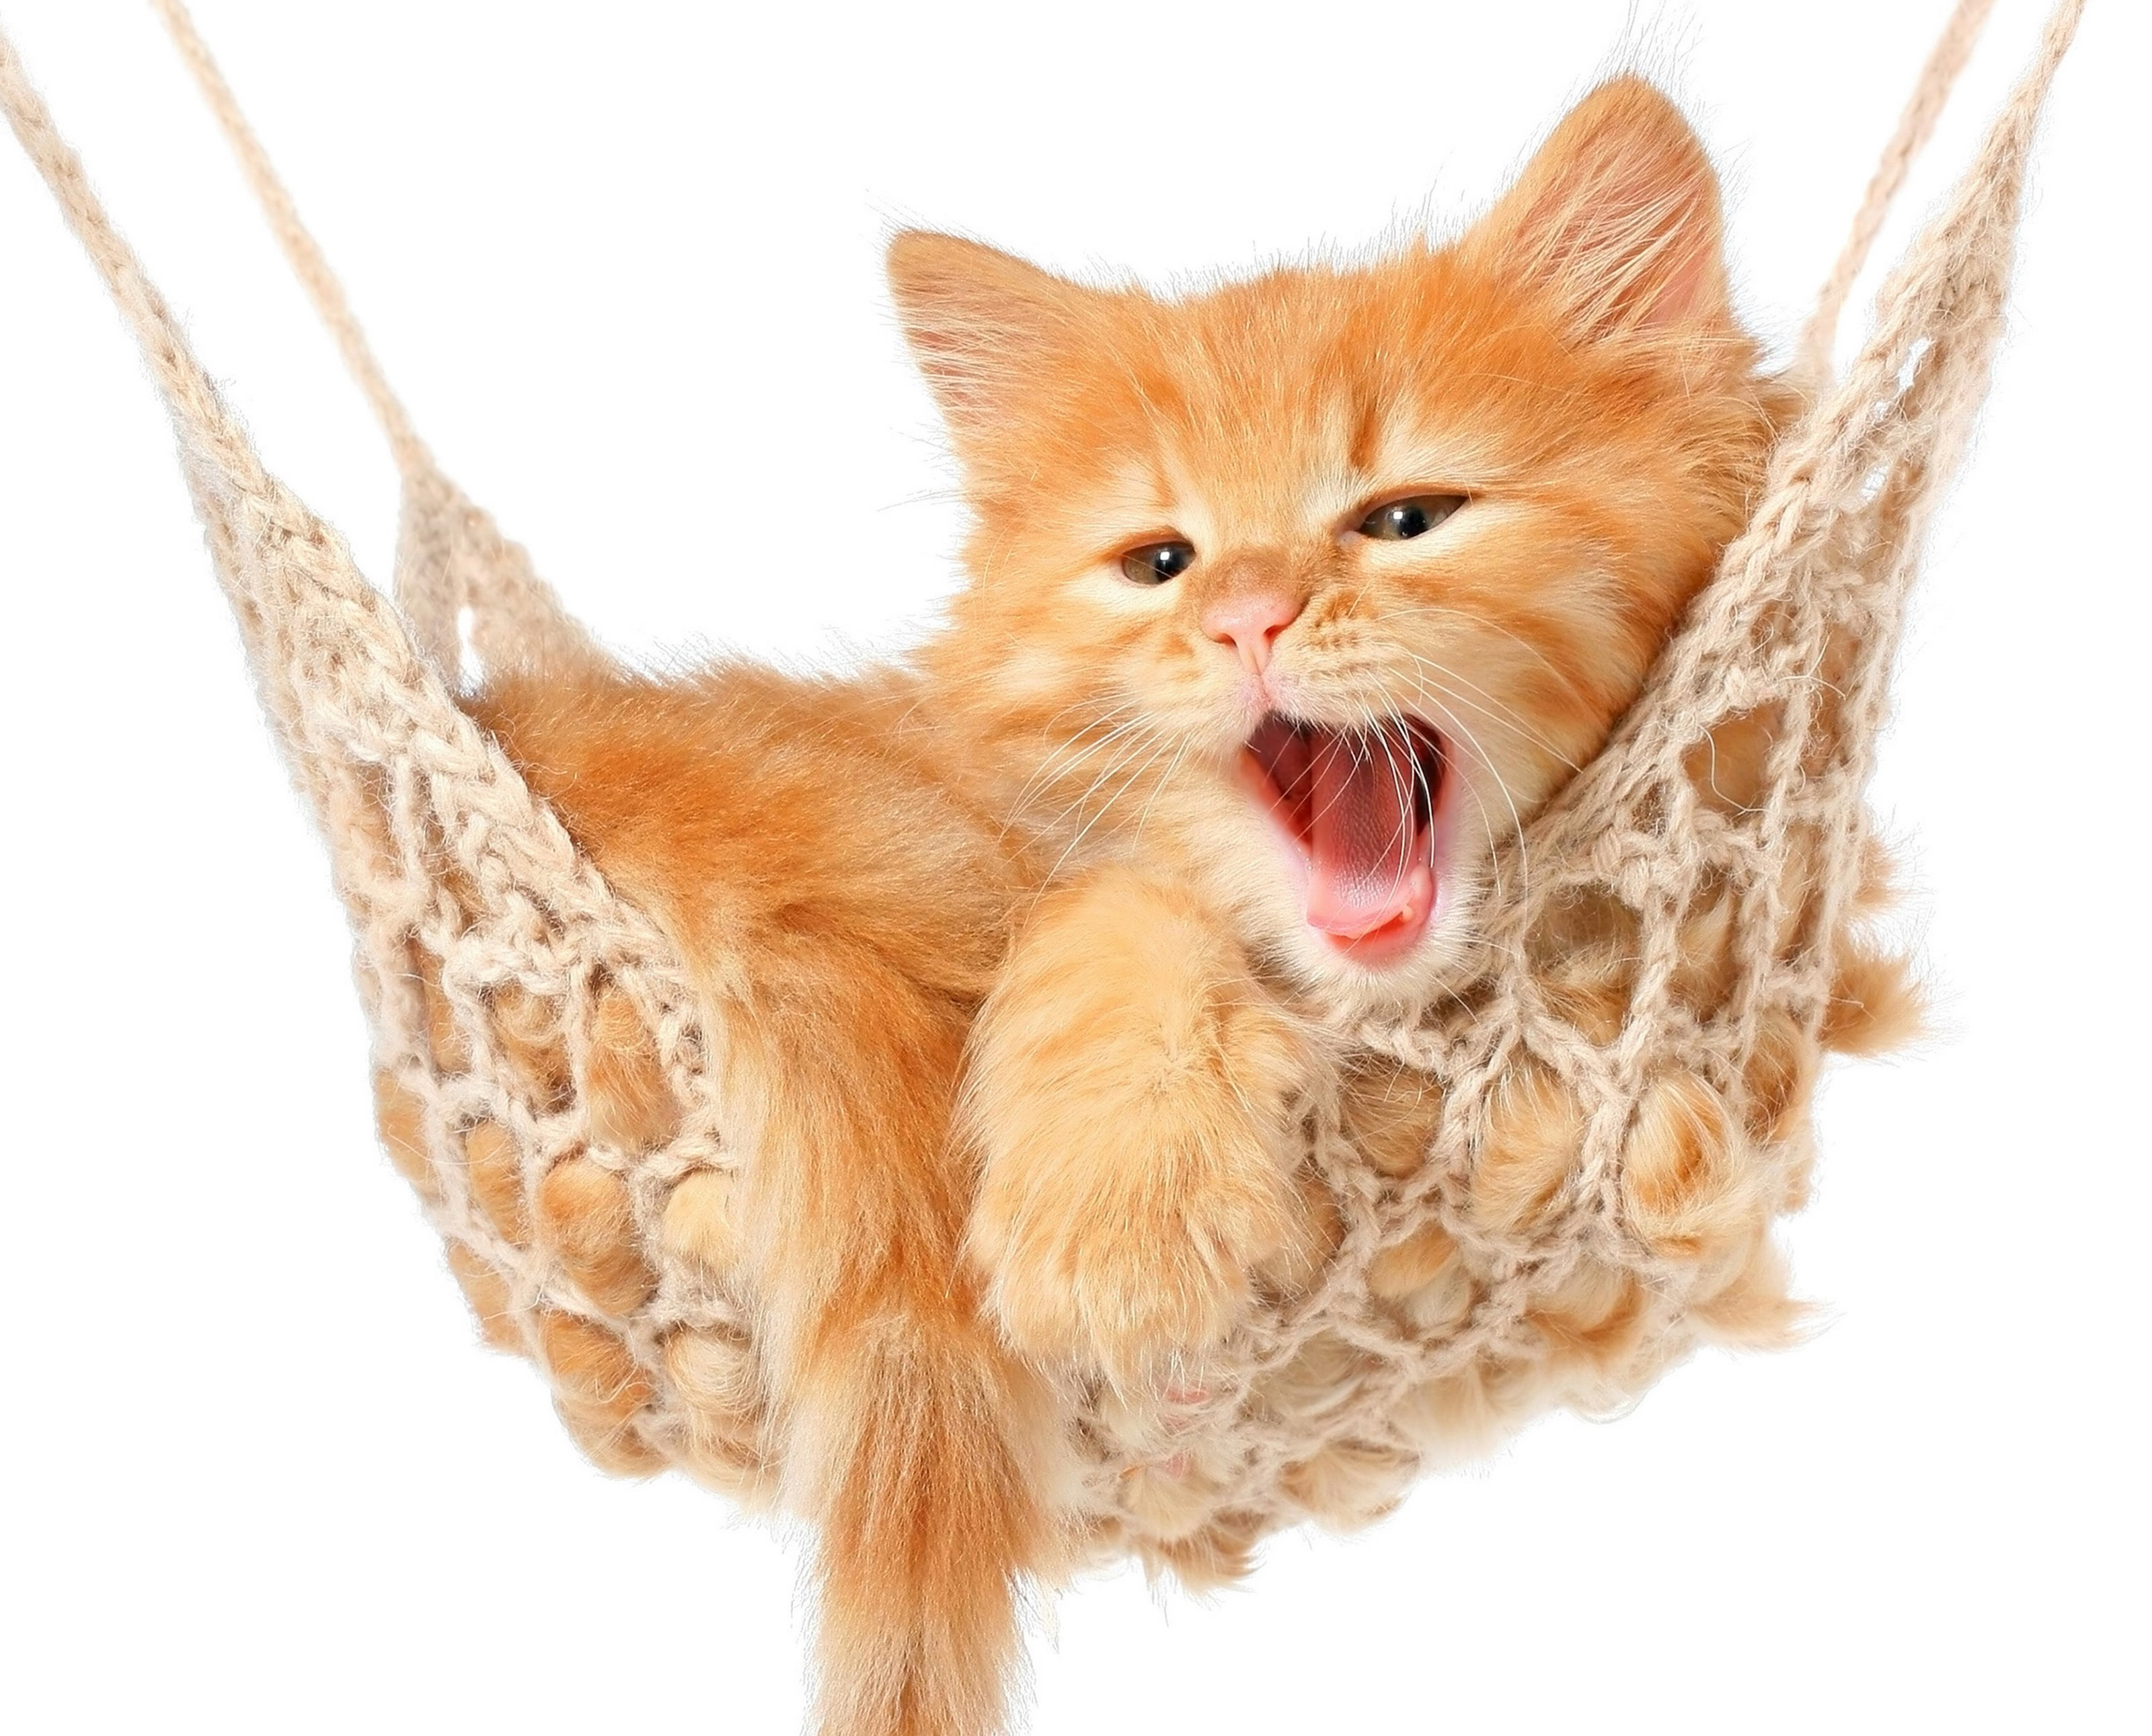 cats, Ginger, Color, Kitten, Animals Wallpaper